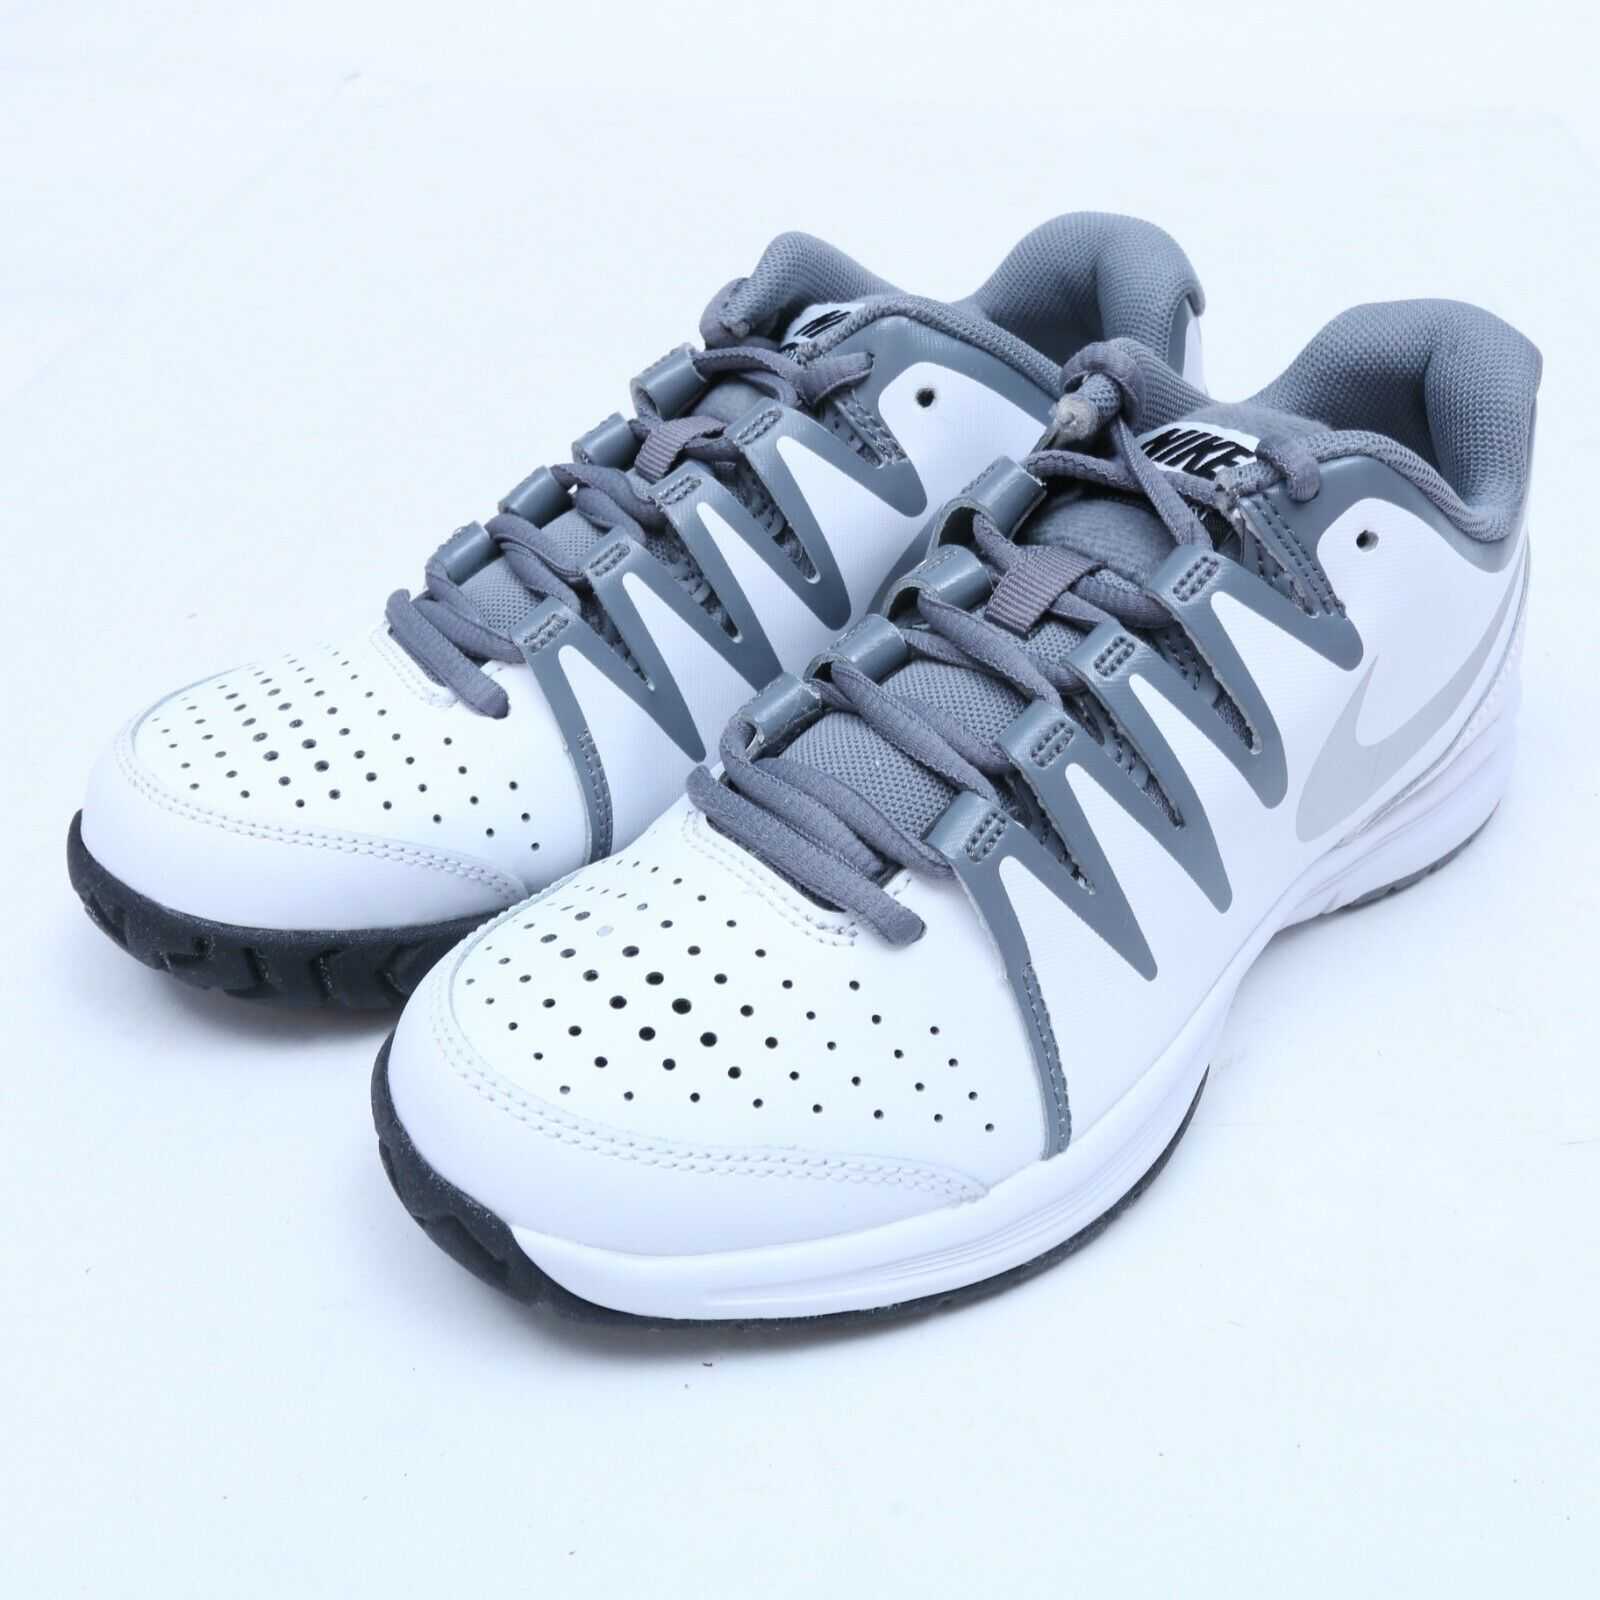 Nike Vapor Court Womens Tennis Shoes